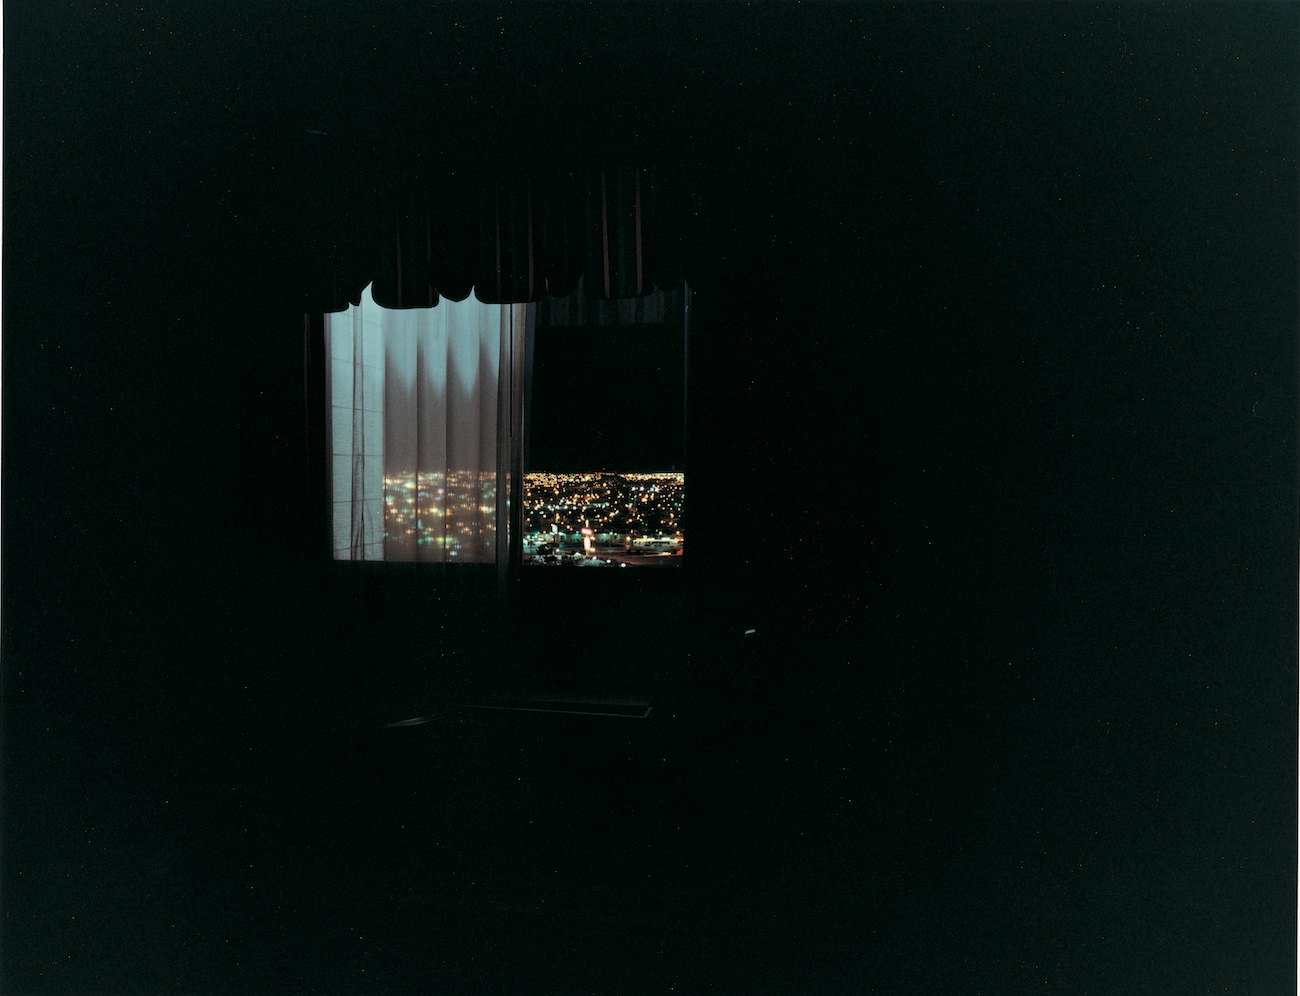 driving all night (hotel window), 2000, C-print, 99,5 x 125 cm